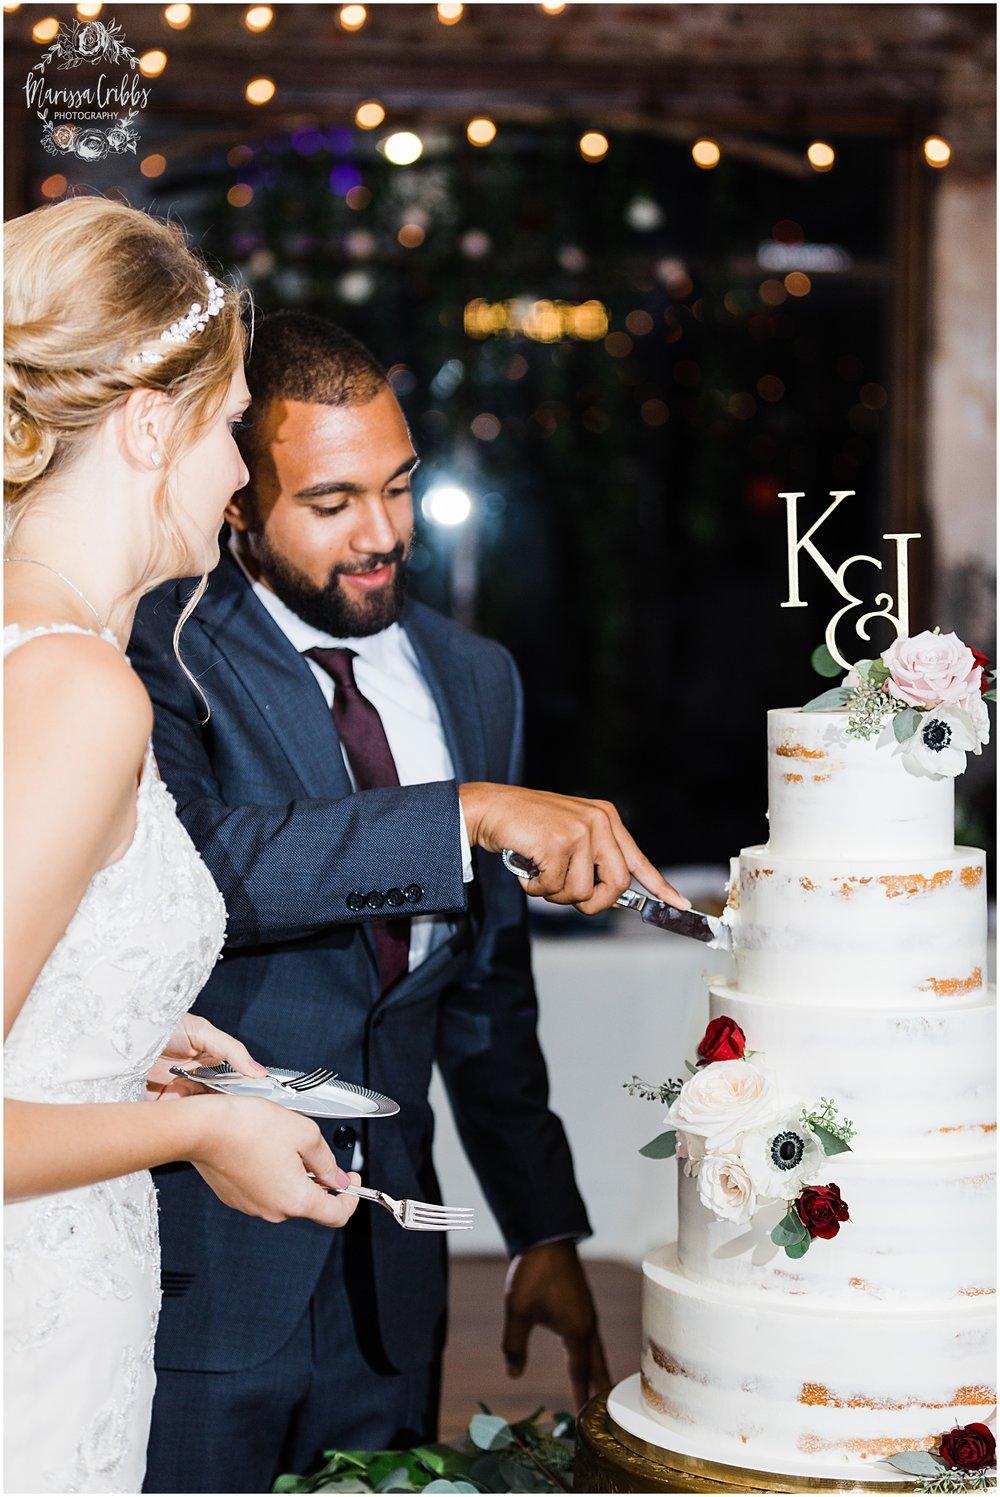 BAUER WEDDING | KELSEA & JUSTIN | MARISSA CRIBBS PHOTOGRAPHY_6586.jpg